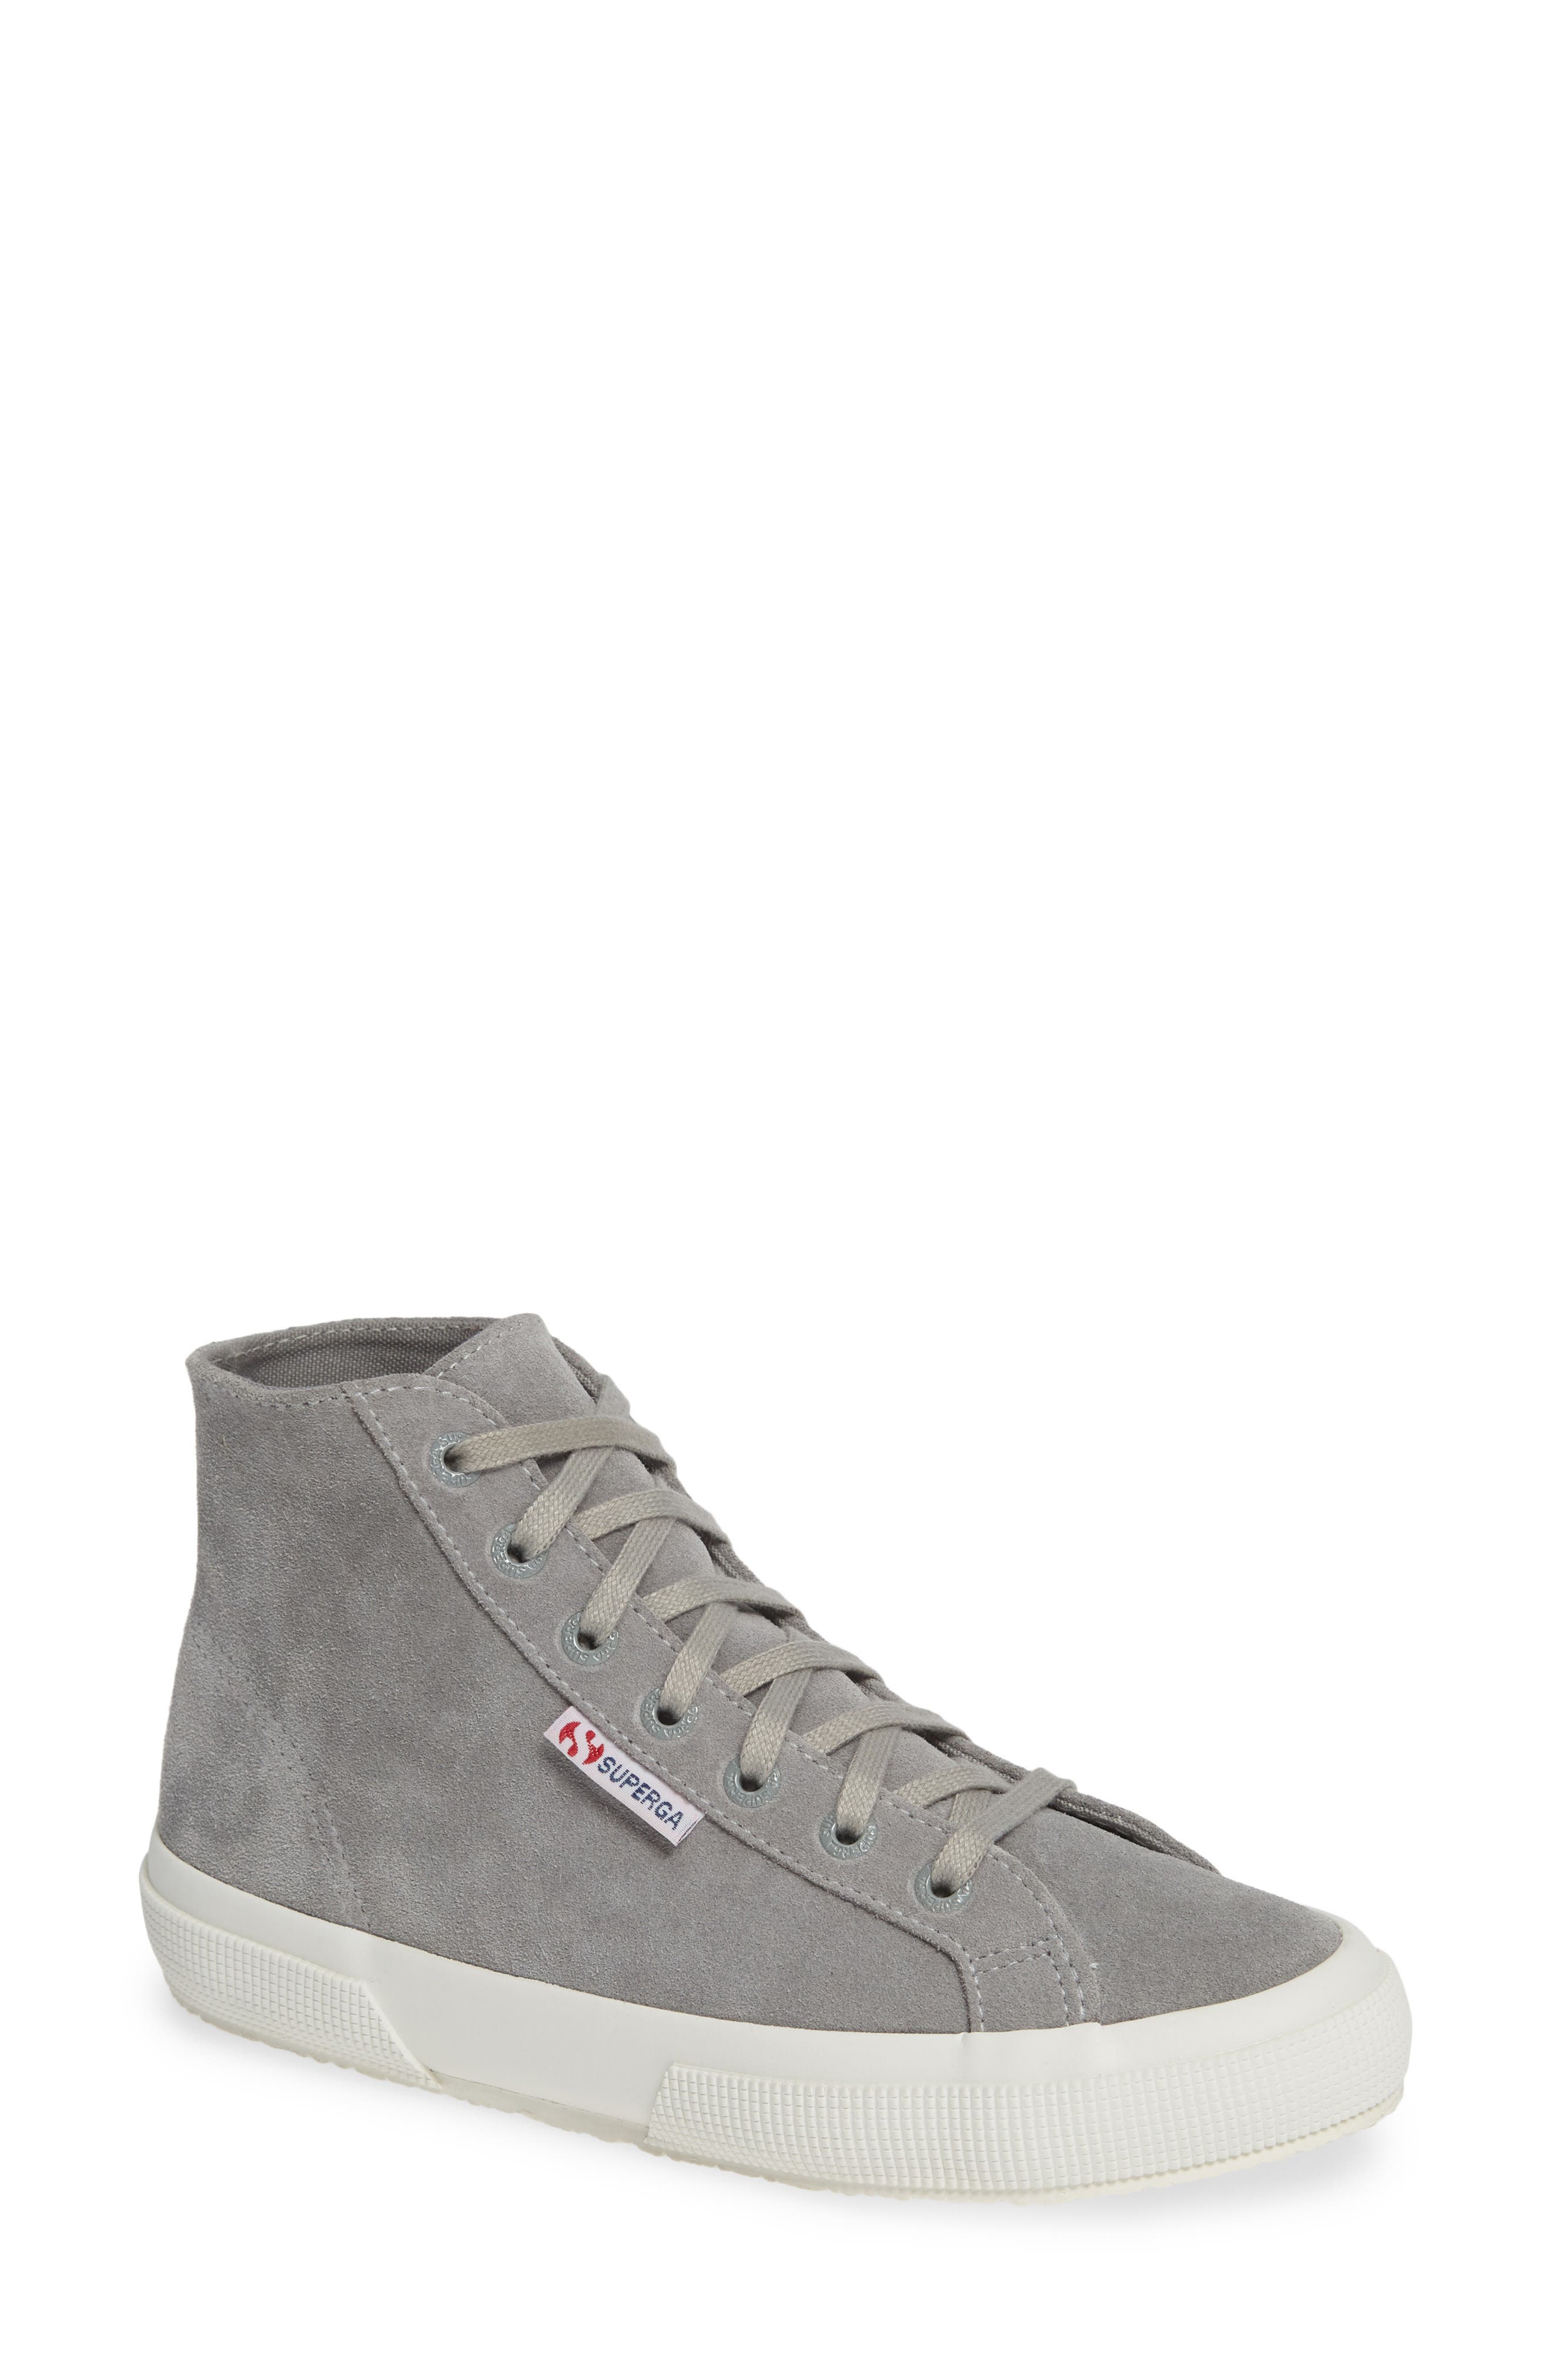 2795 High Top Sneaker,                             Main thumbnail 1, color,                             020